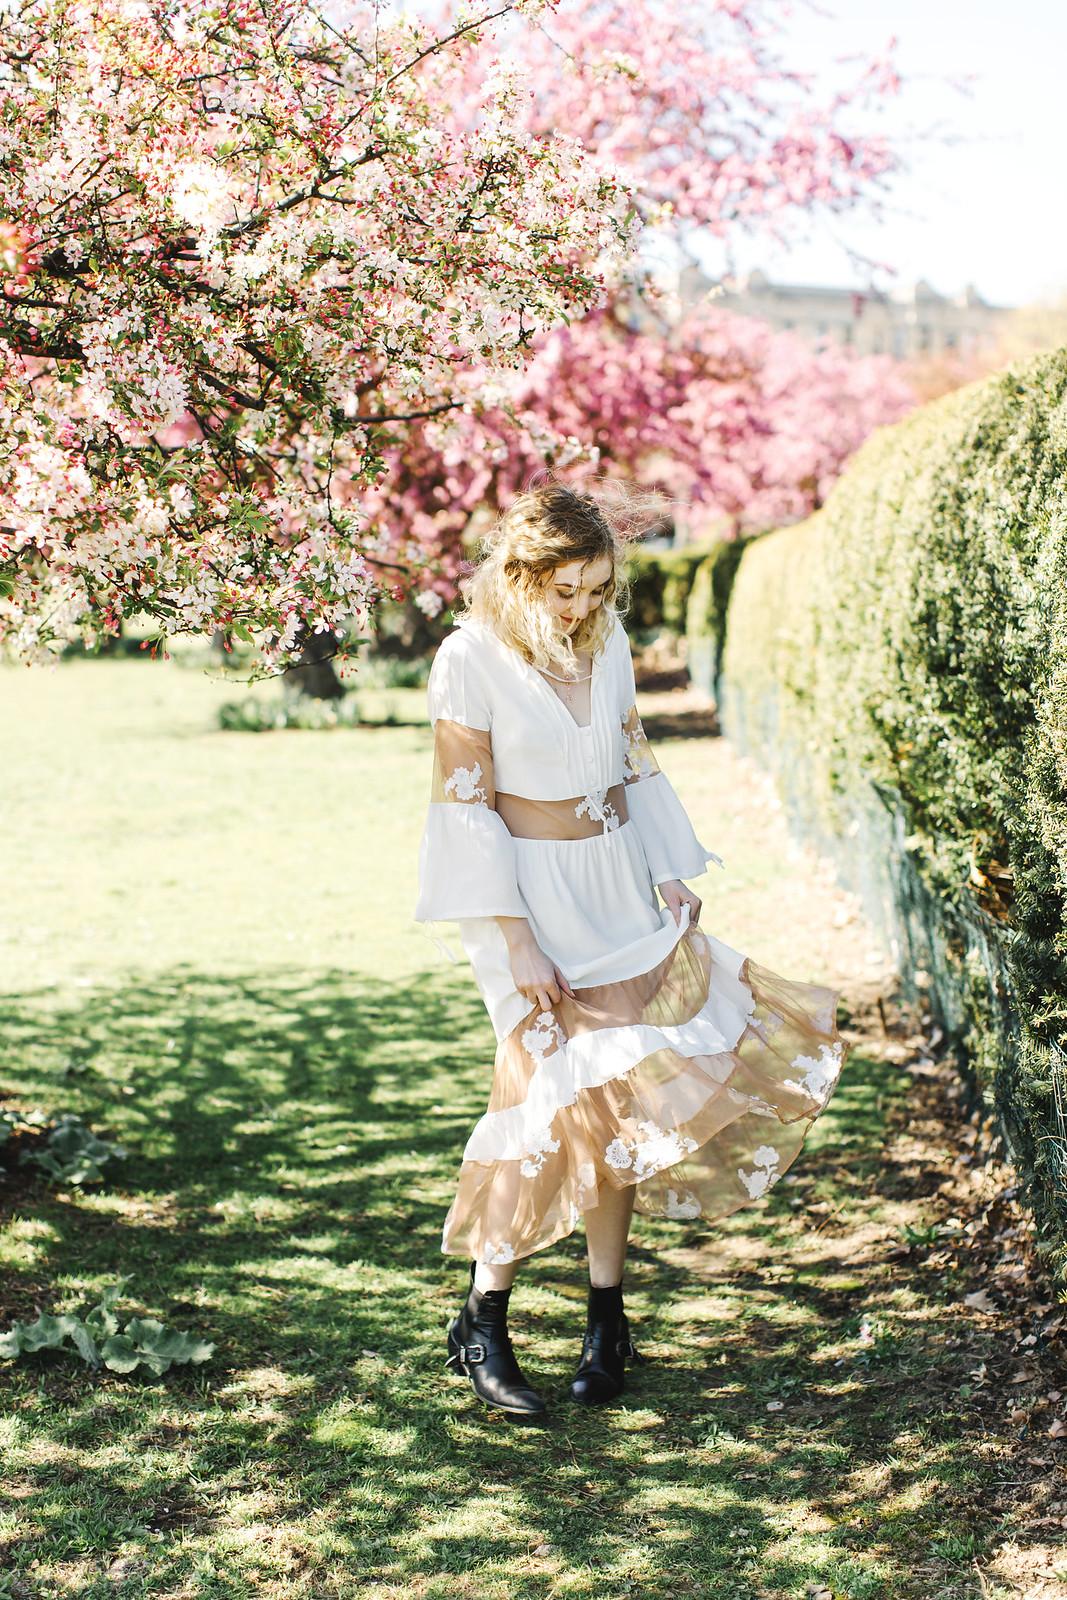 For Love and Lemons Eva Midi Dress from Free People shot by Lena Mirisola on juliettelaura.blogspot.com